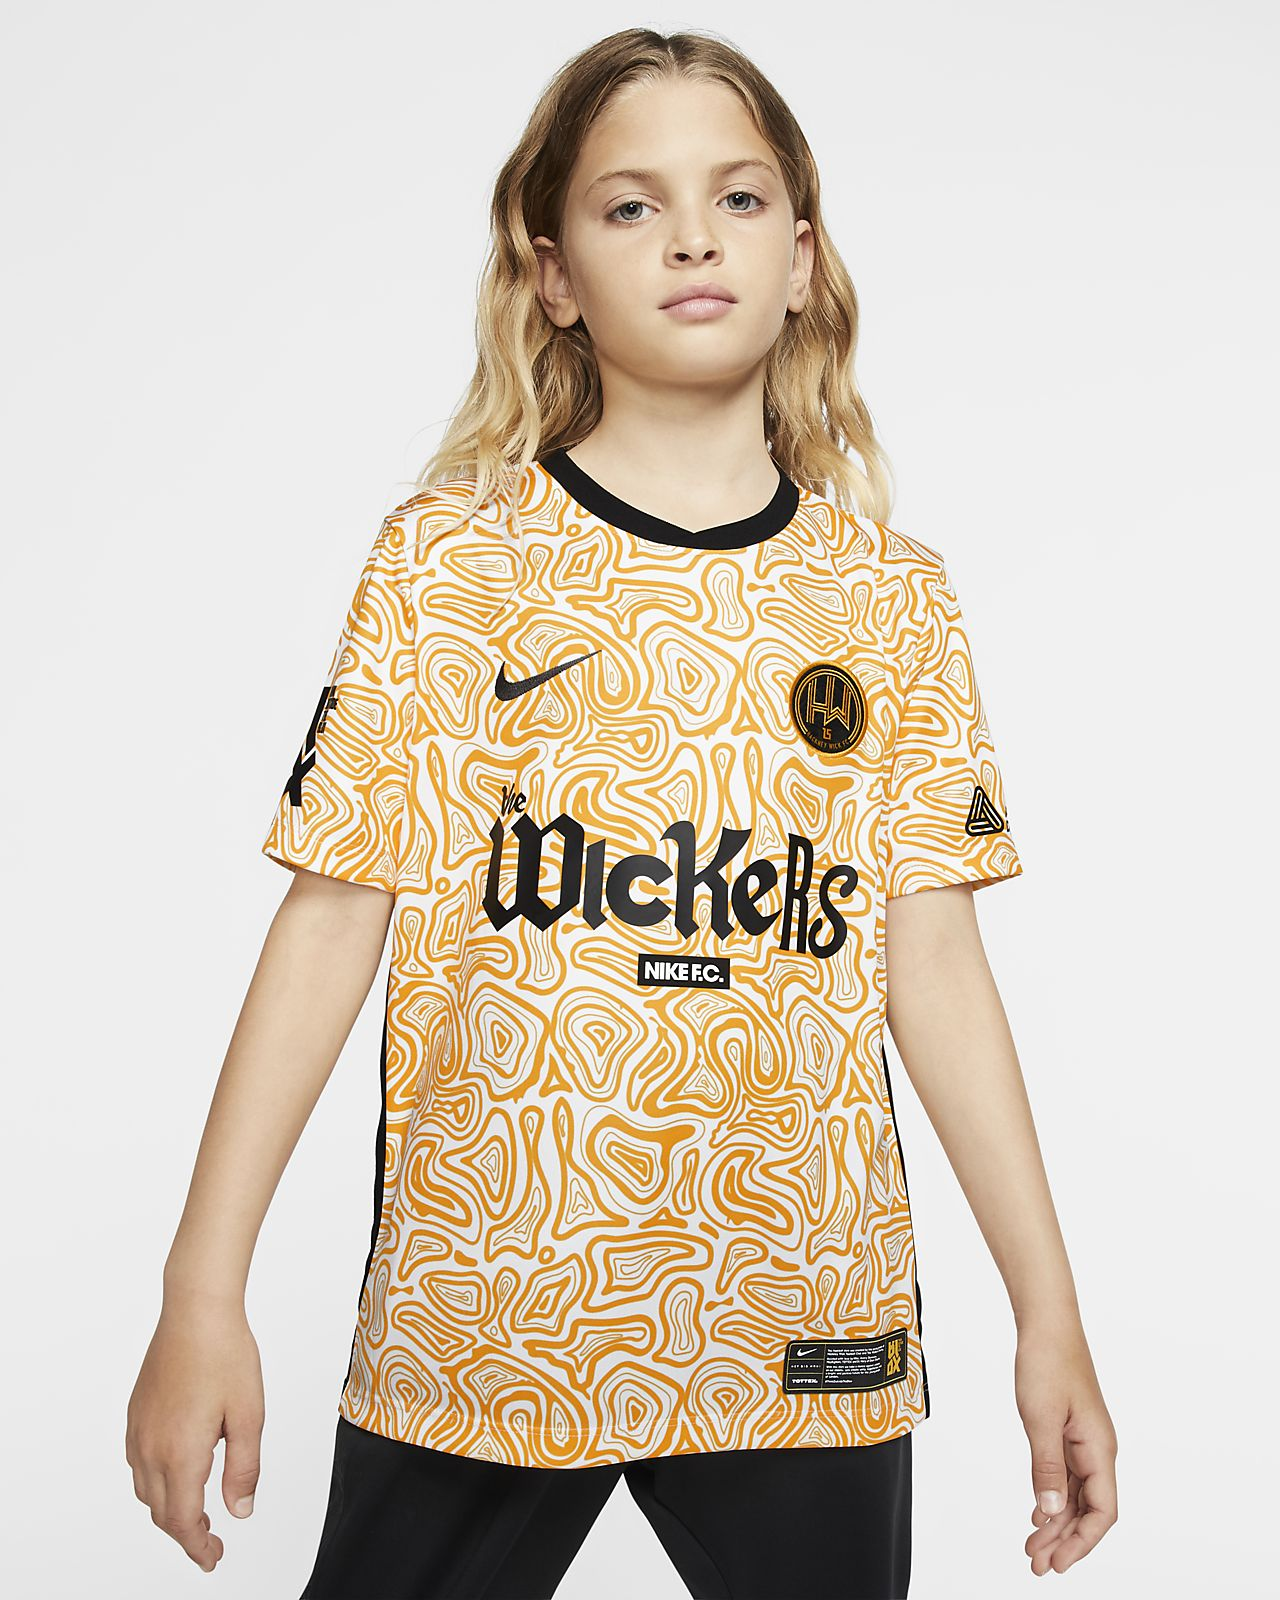 Hackney Wick FC Away Older Kids' Football Shirt